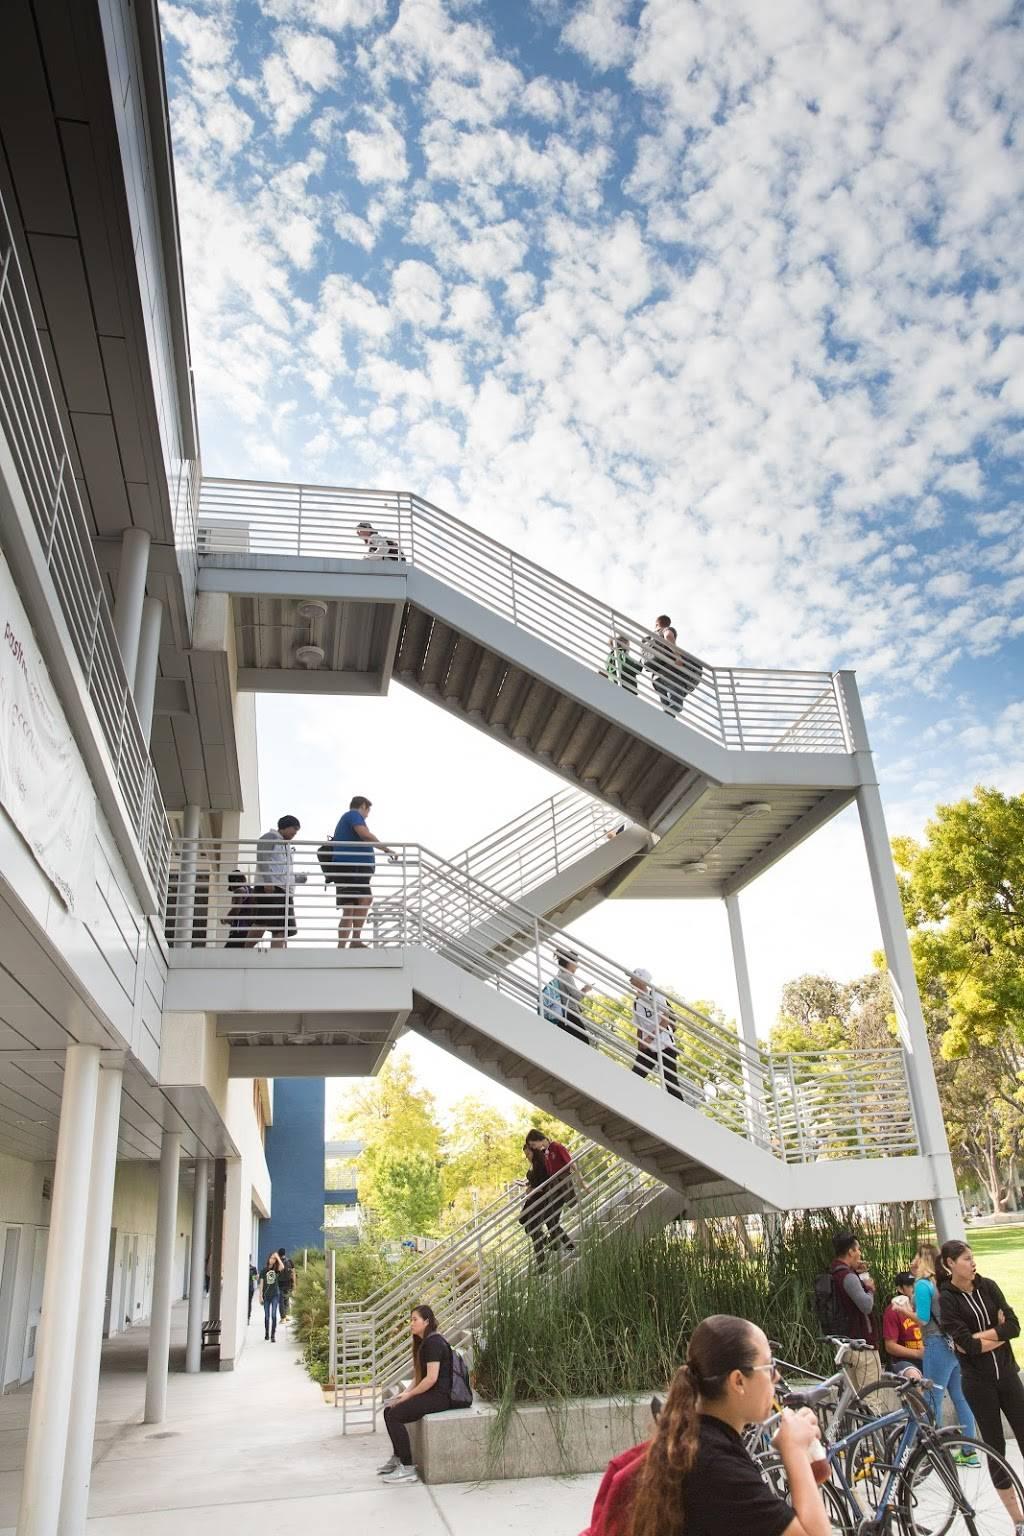 San Jose City College - university  | Photo 6 of 7 | Address: 2100 Moorpark Ave, San Jose, CA 95128, USA | Phone: (408) 298-2181